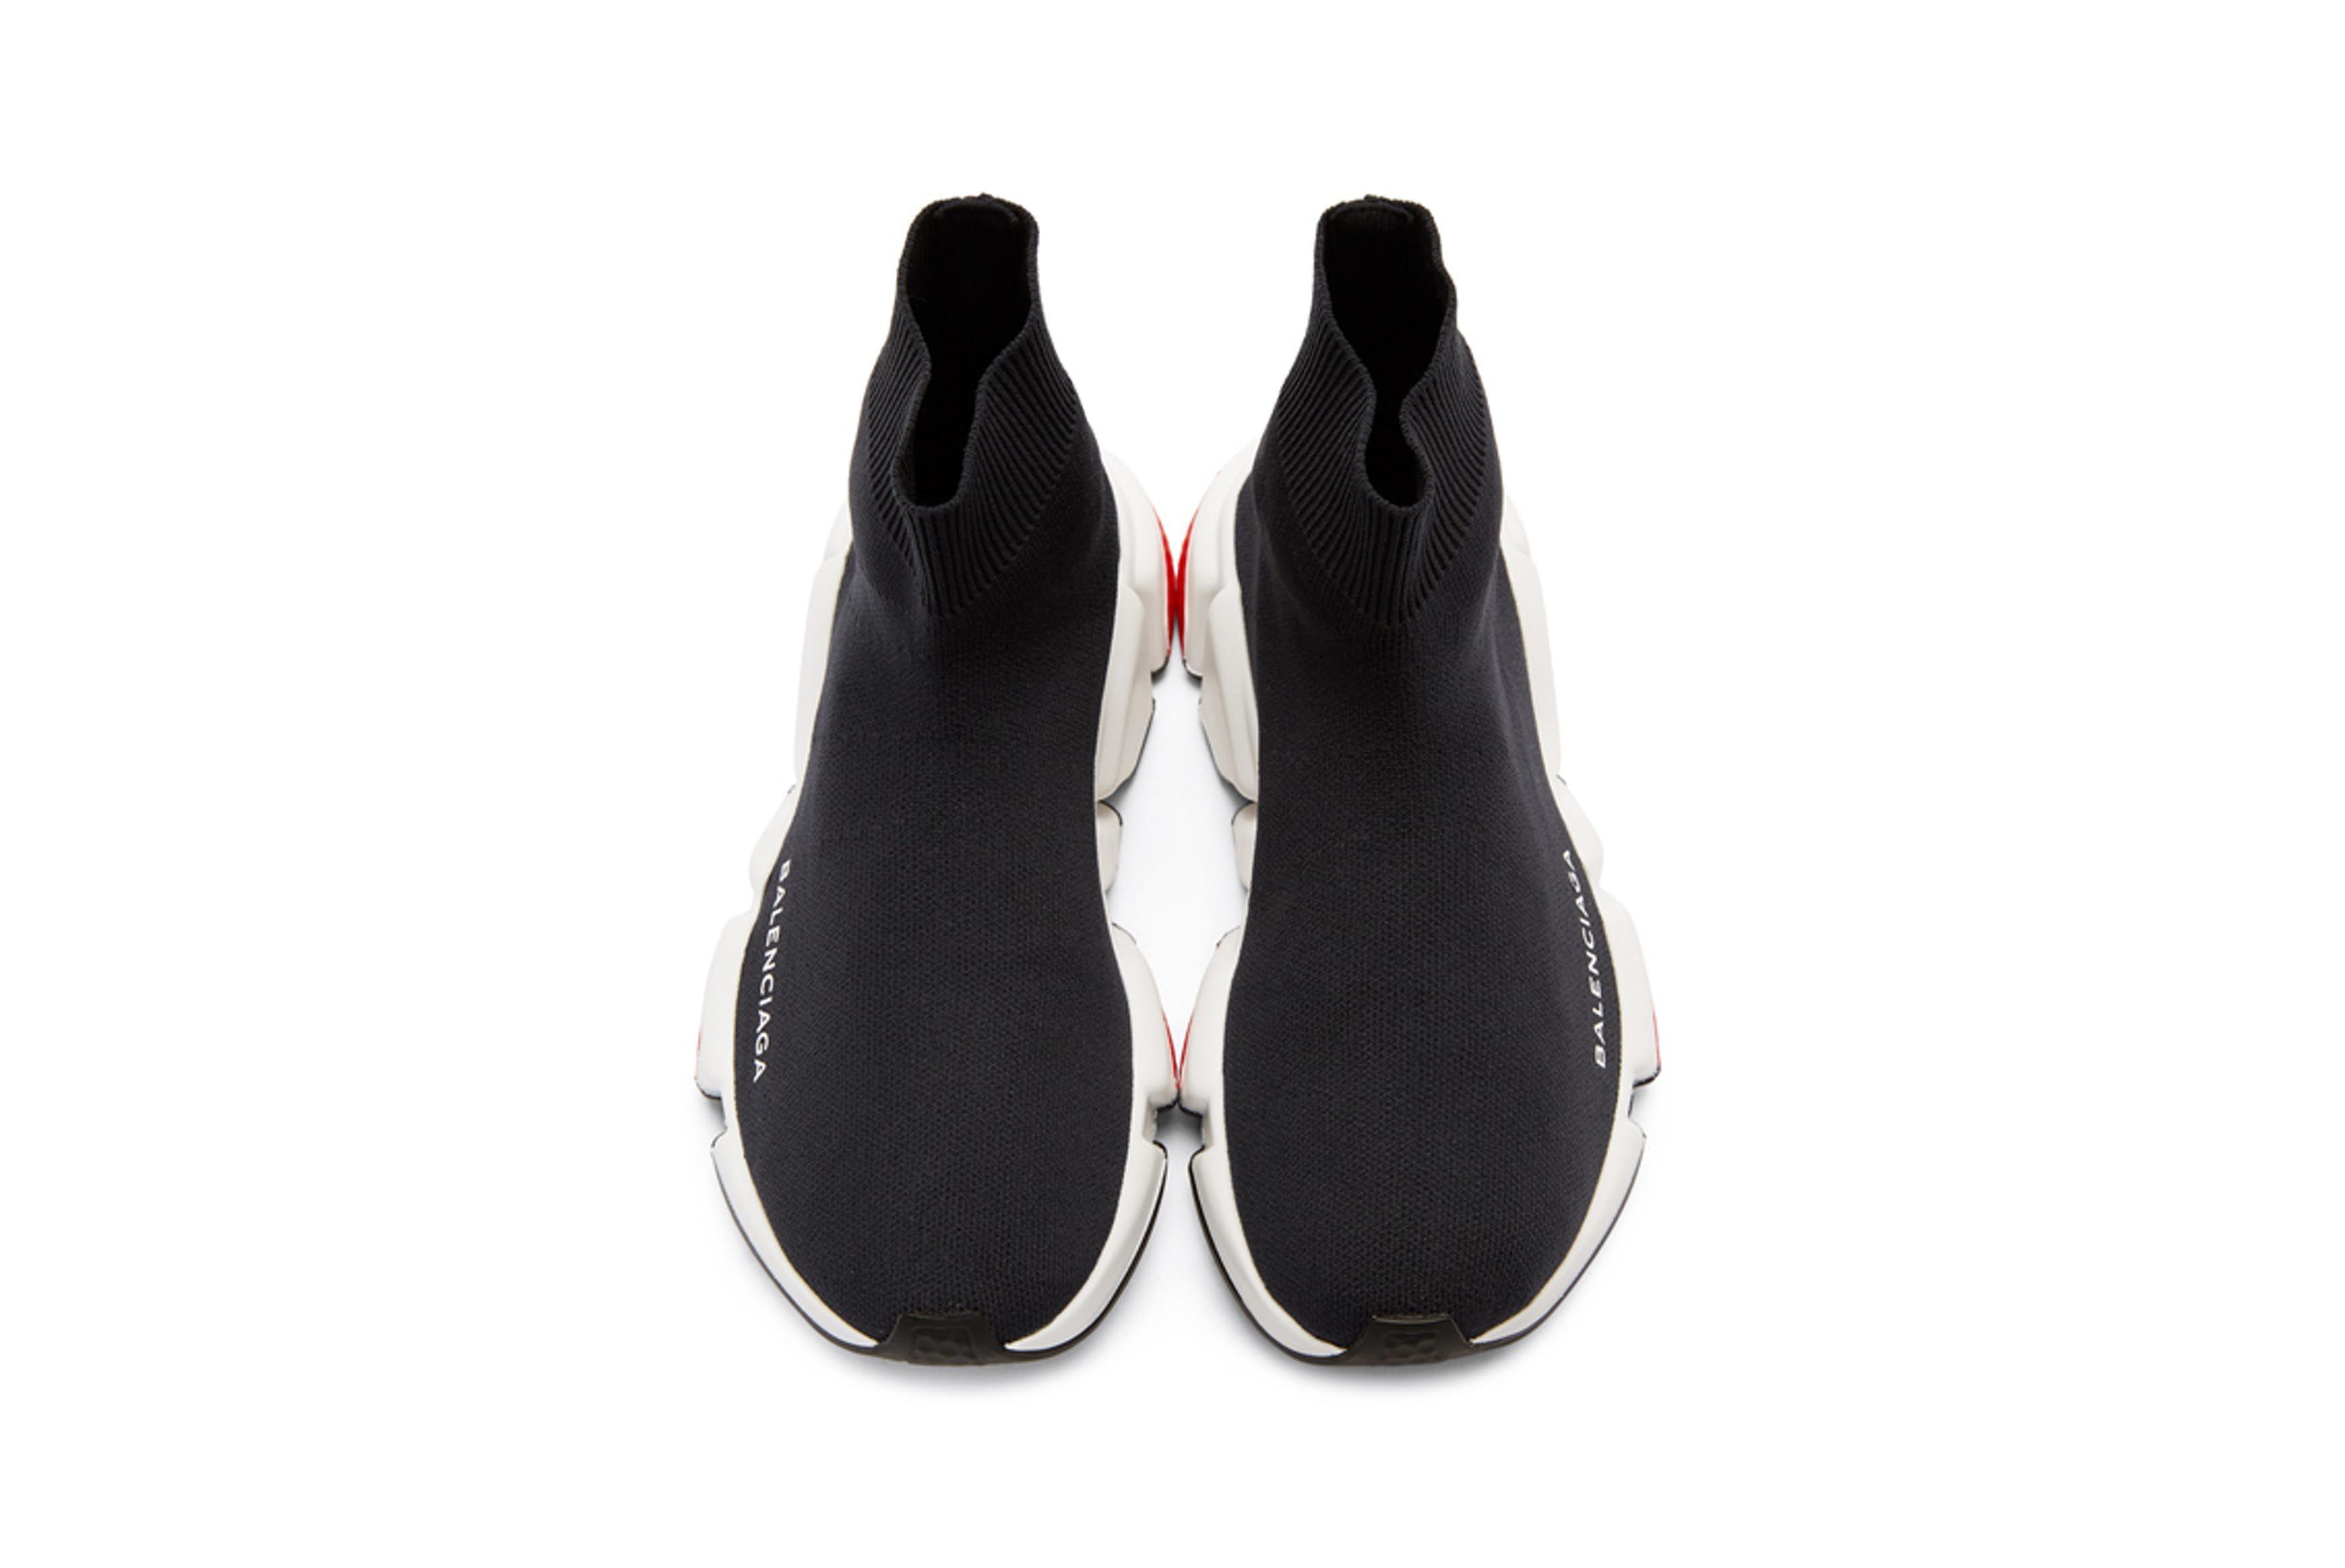 Balenciaga Speed Low High Top Sneakers Black Navy 4 Sneaker Freaker